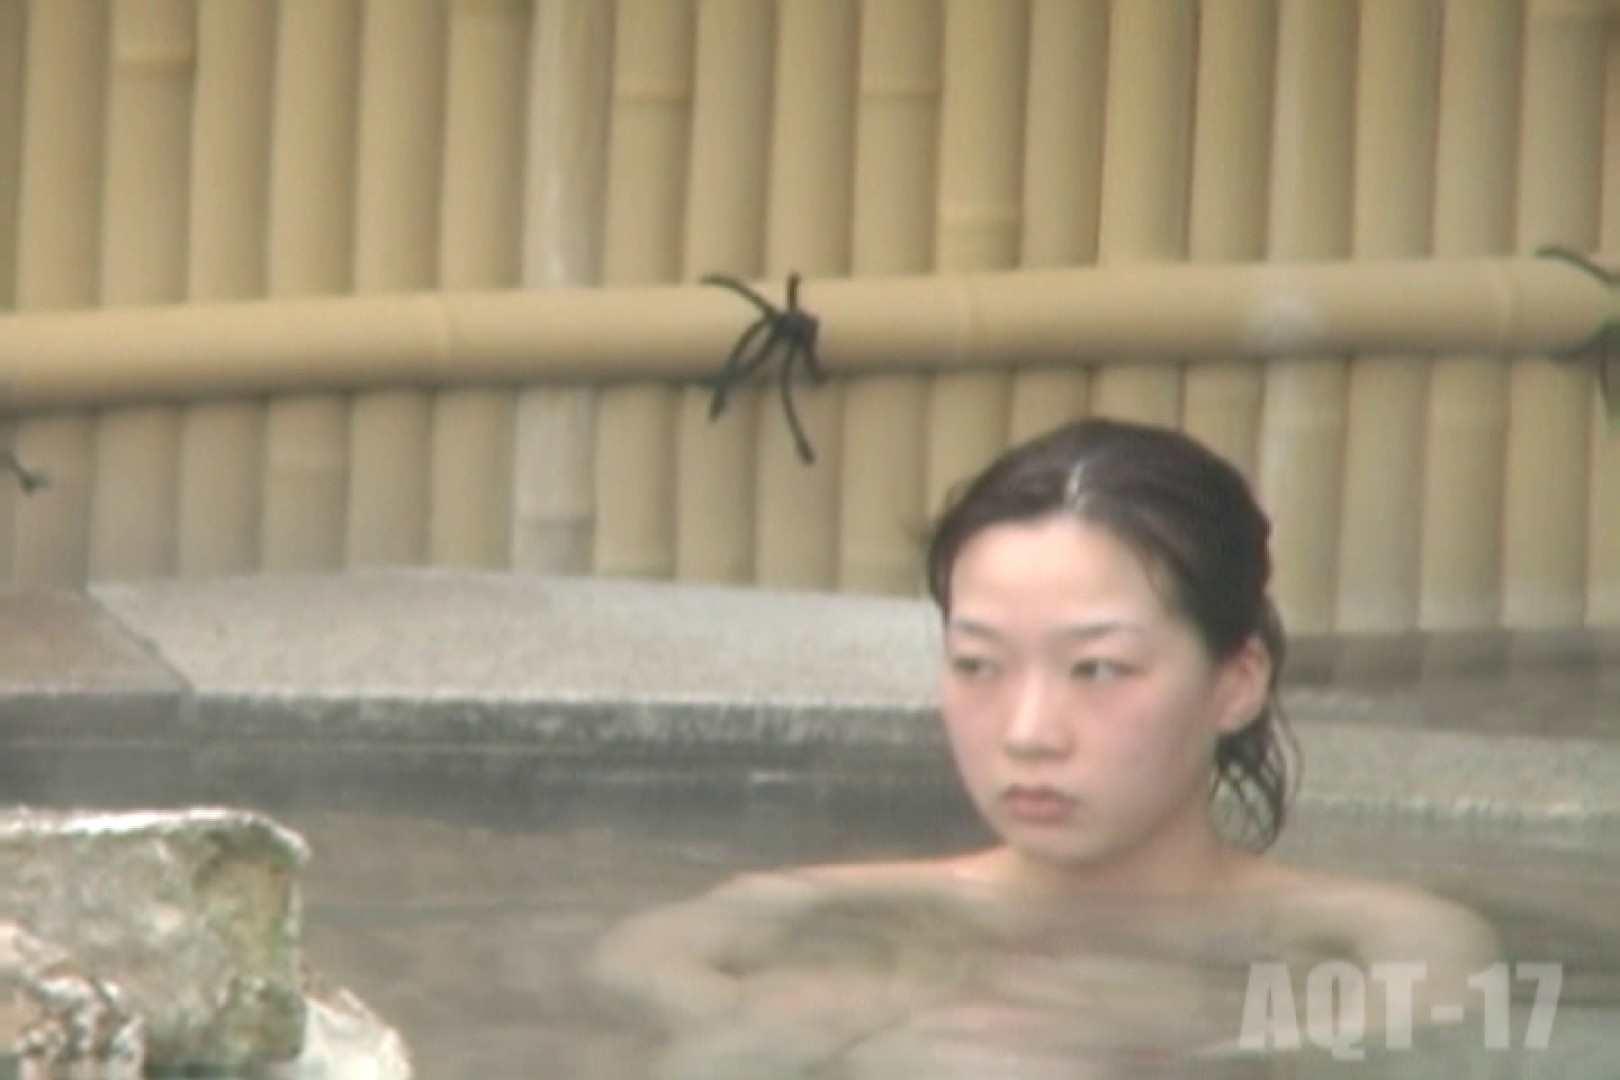 Aquaな露天風呂Vol.848 露天風呂突入 セックス画像 86pic 5